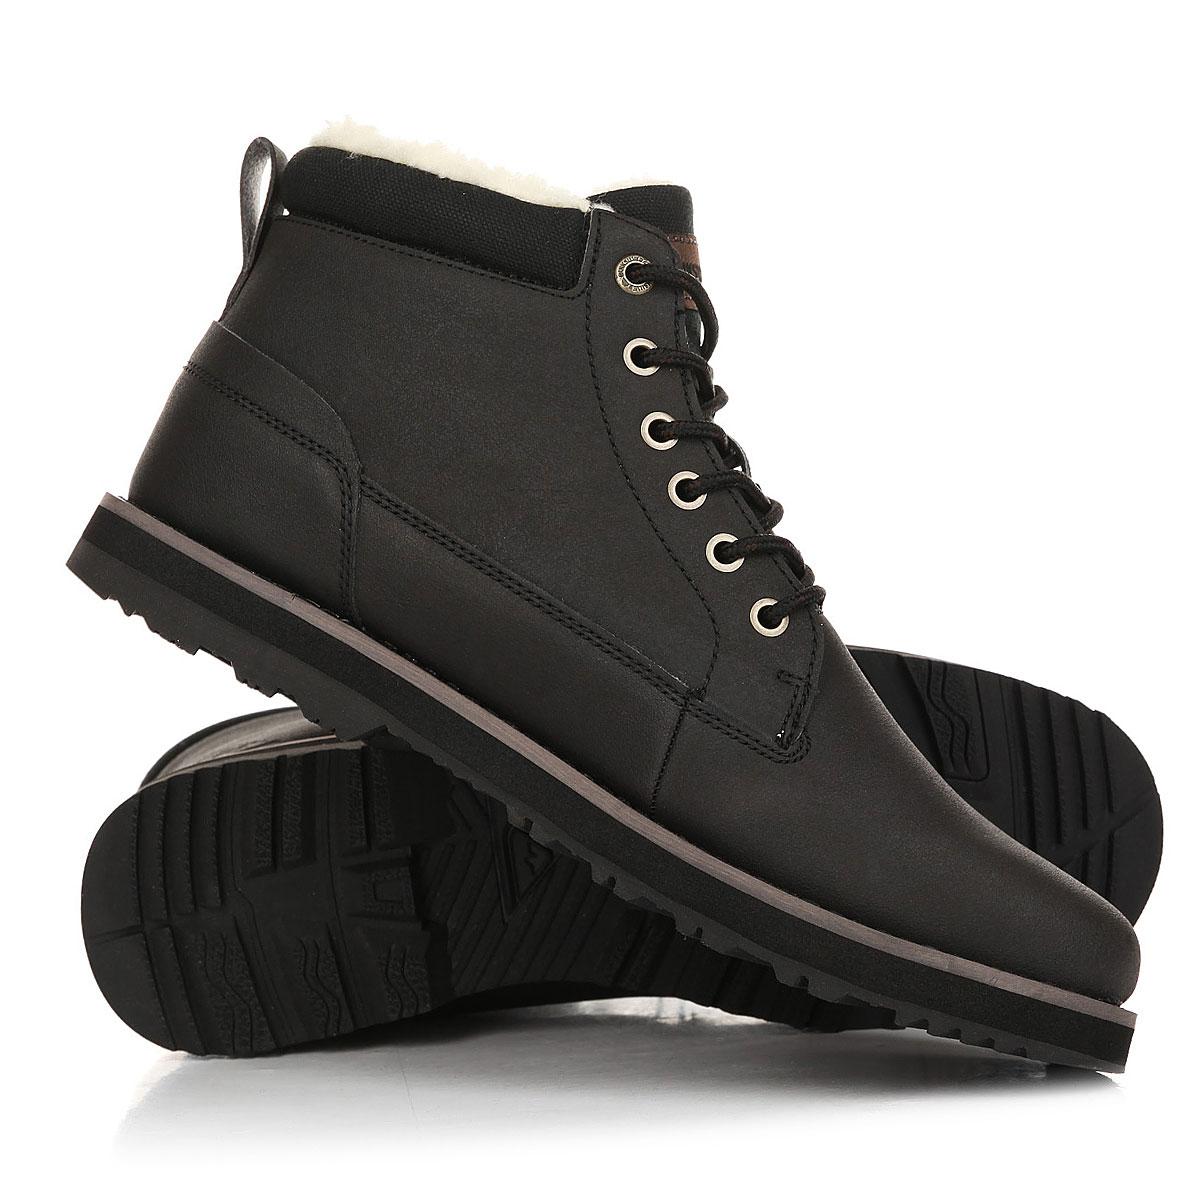 a94dbfec8 Купить ботинки зимние Quiksilver Mission Boot Solid Black ...